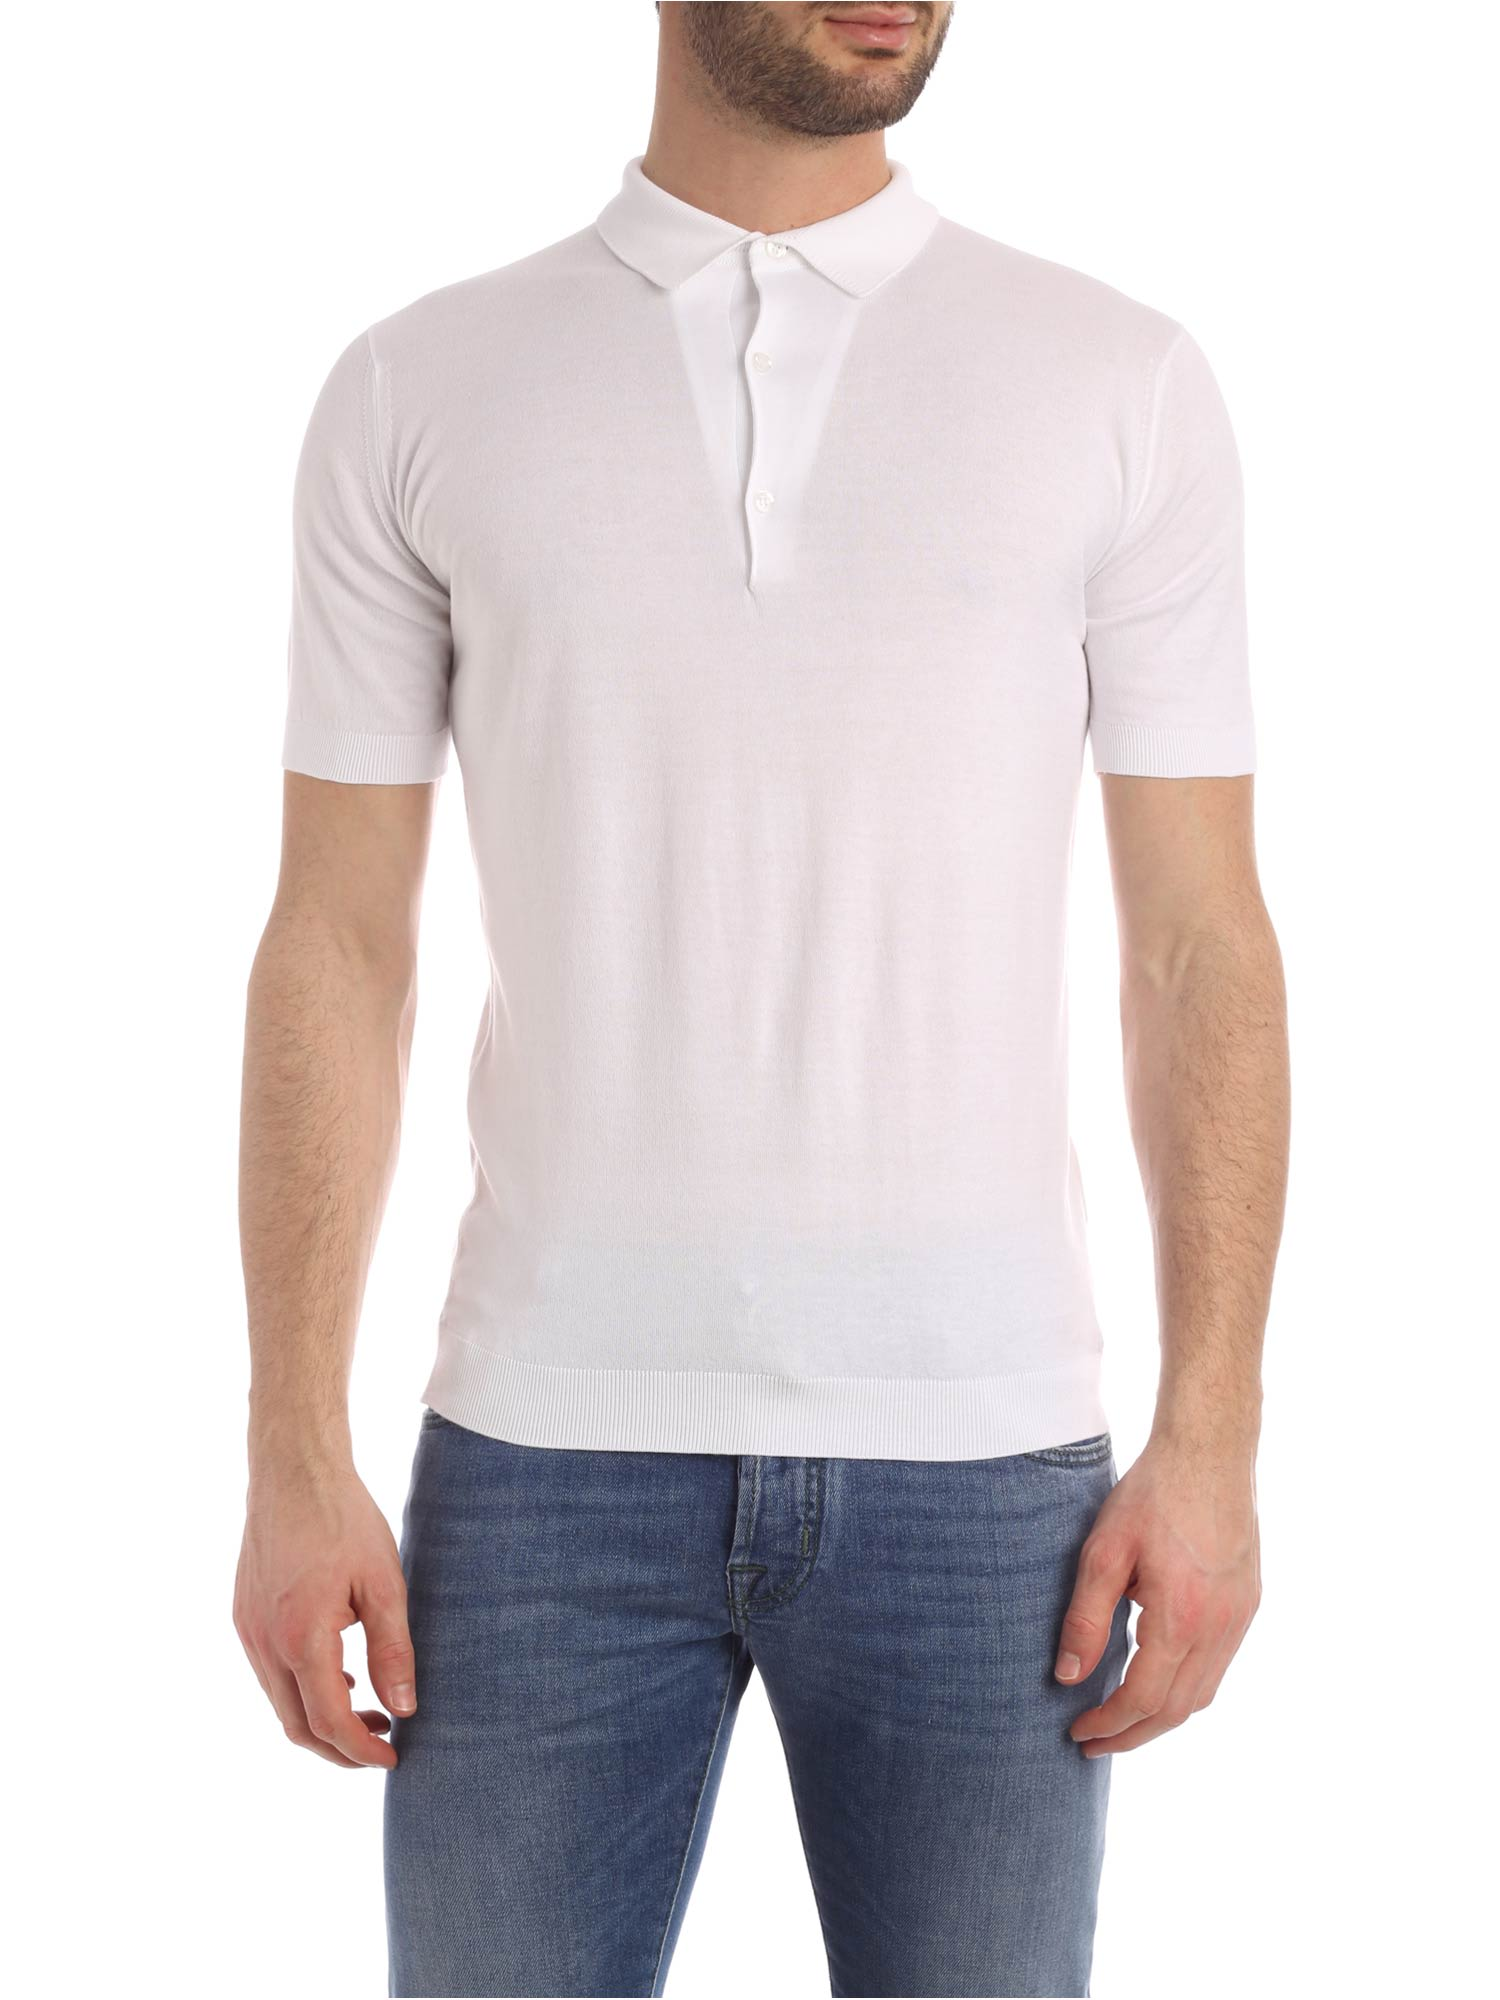 John Smedley Adrian Shirt Ss